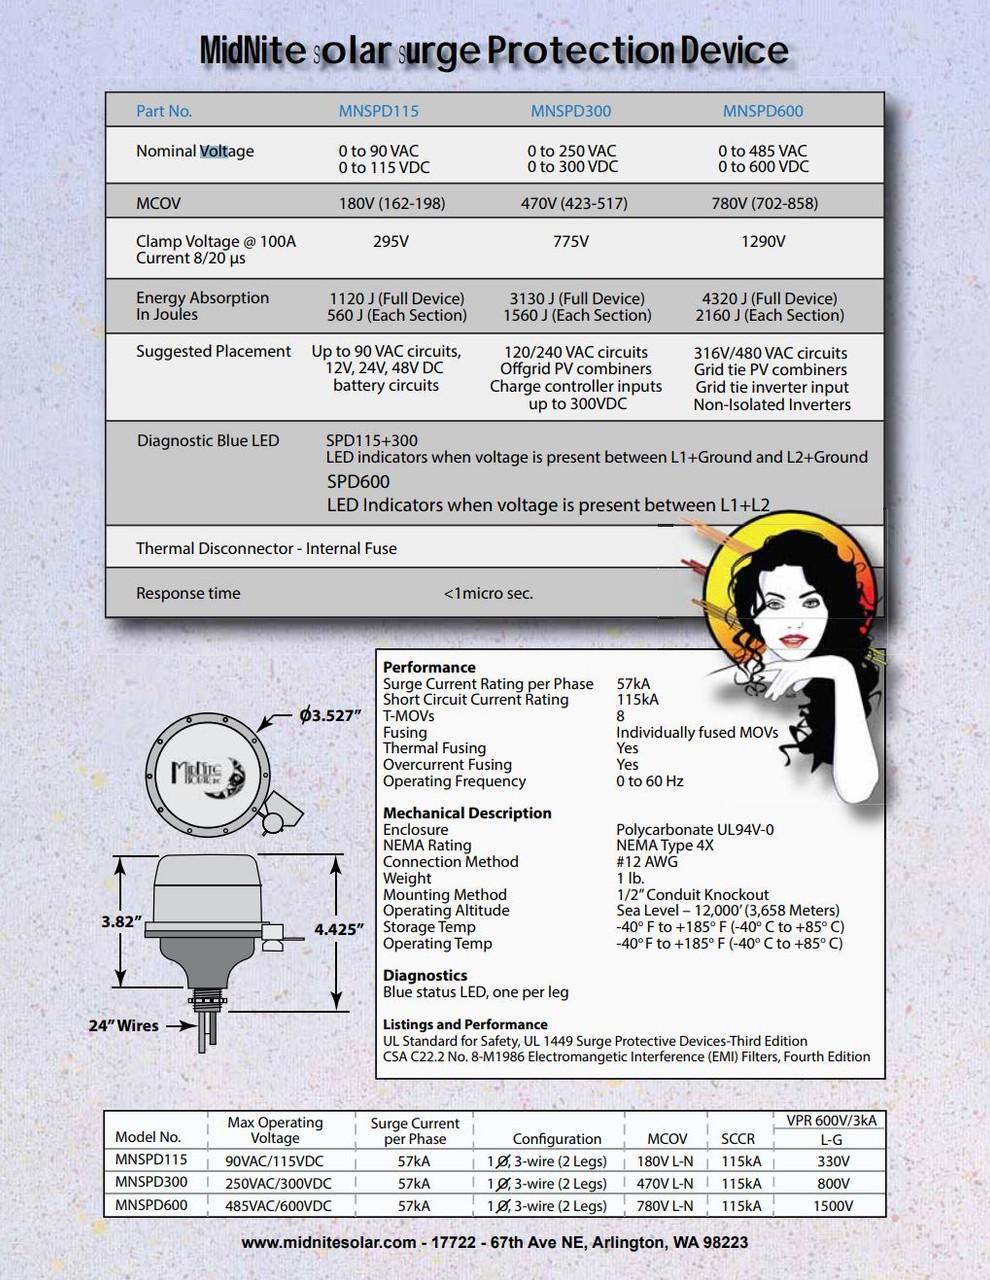 Surge Protection Device MidNite Solar MNSPD-300-DC Surge Arrestor